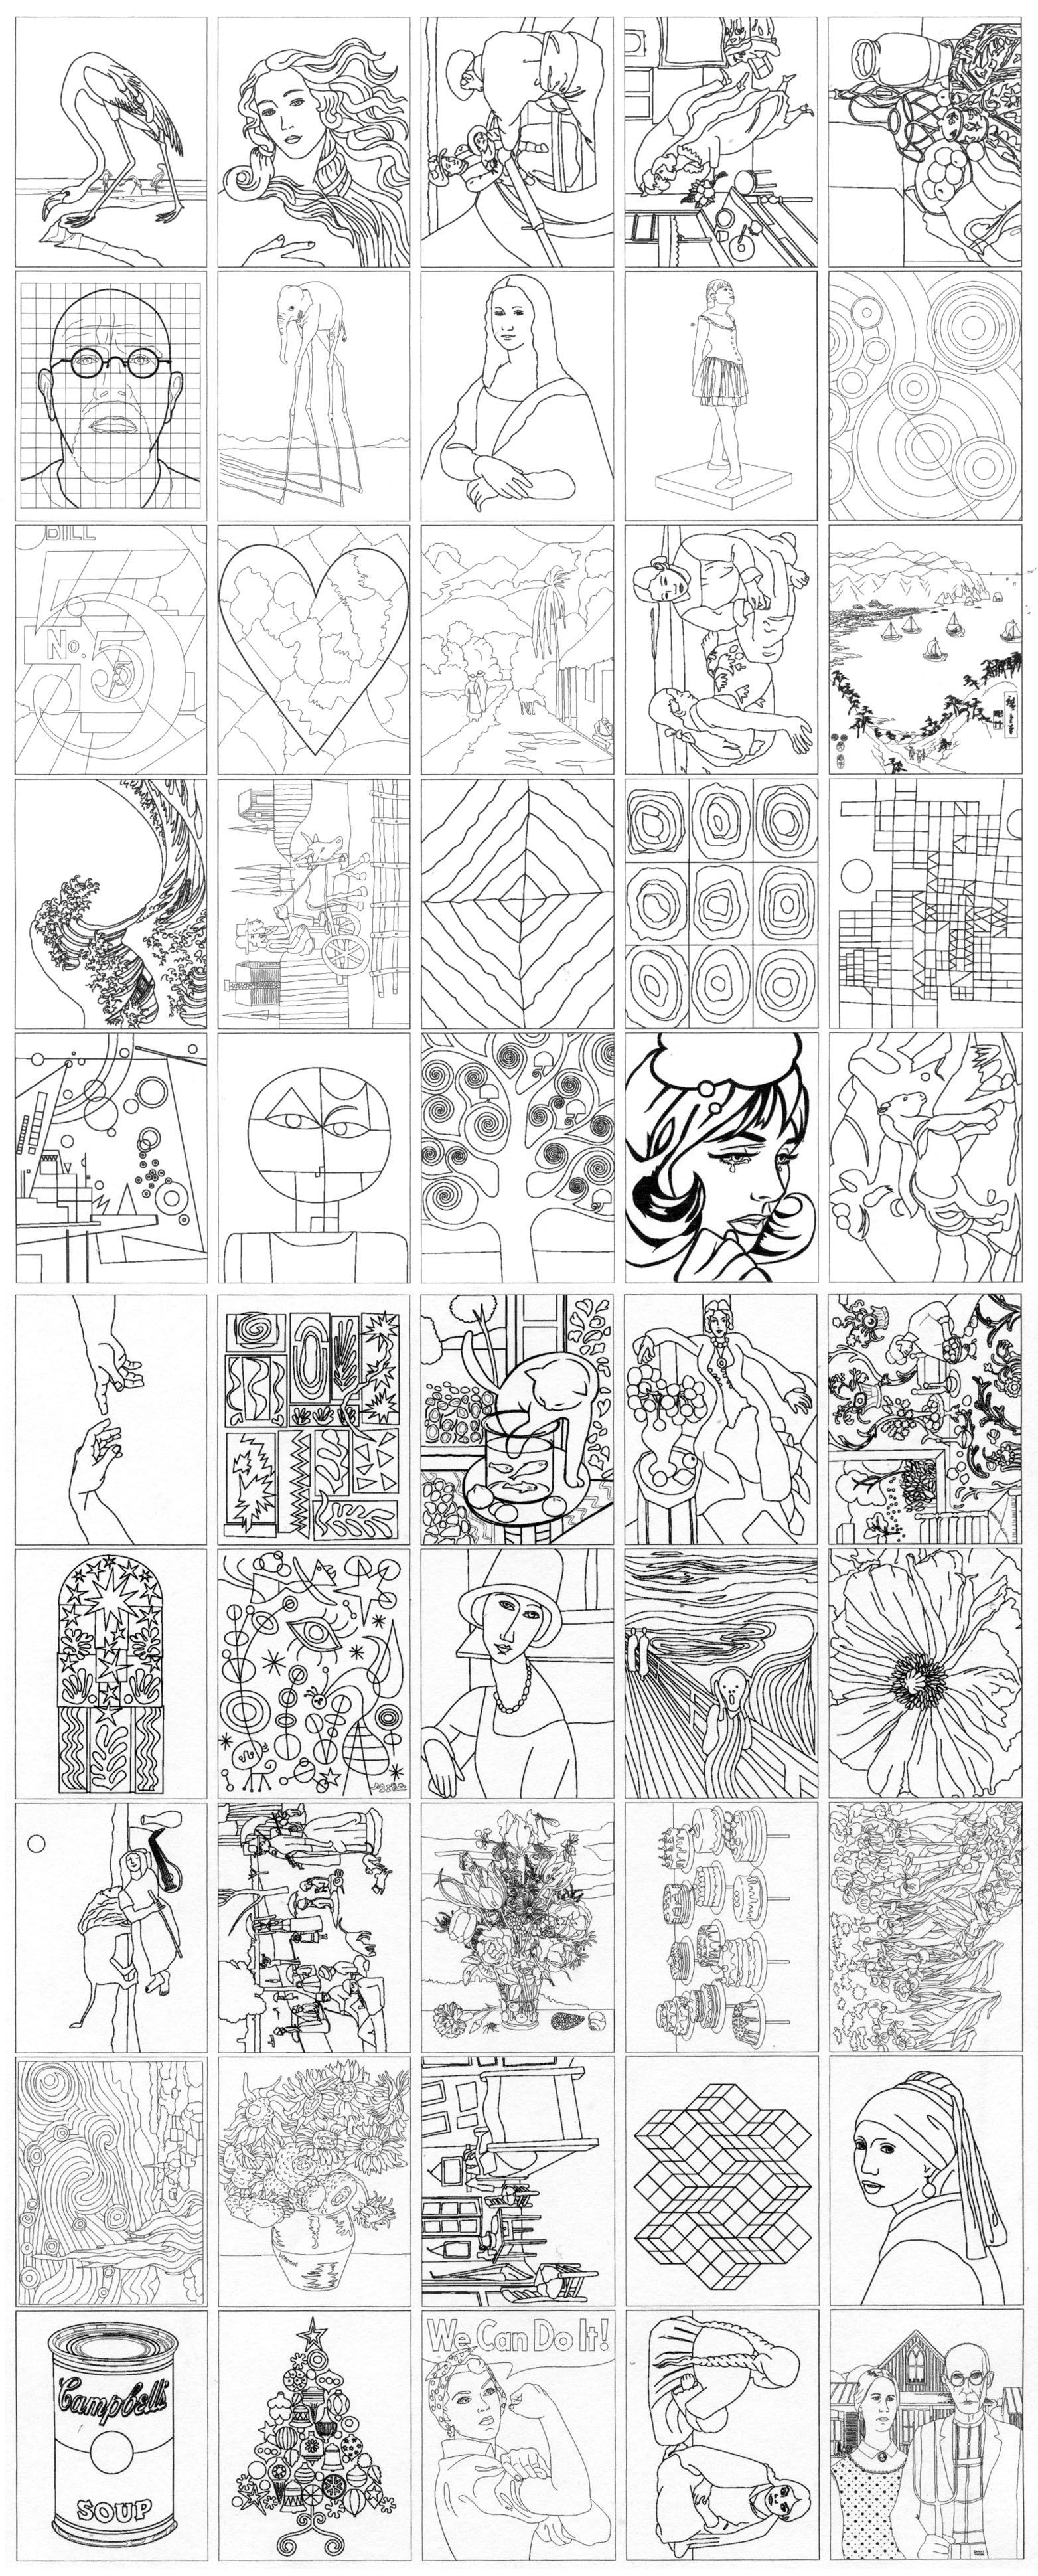 Fine Art Coloring Ebook Art Projects For Kids Artideas